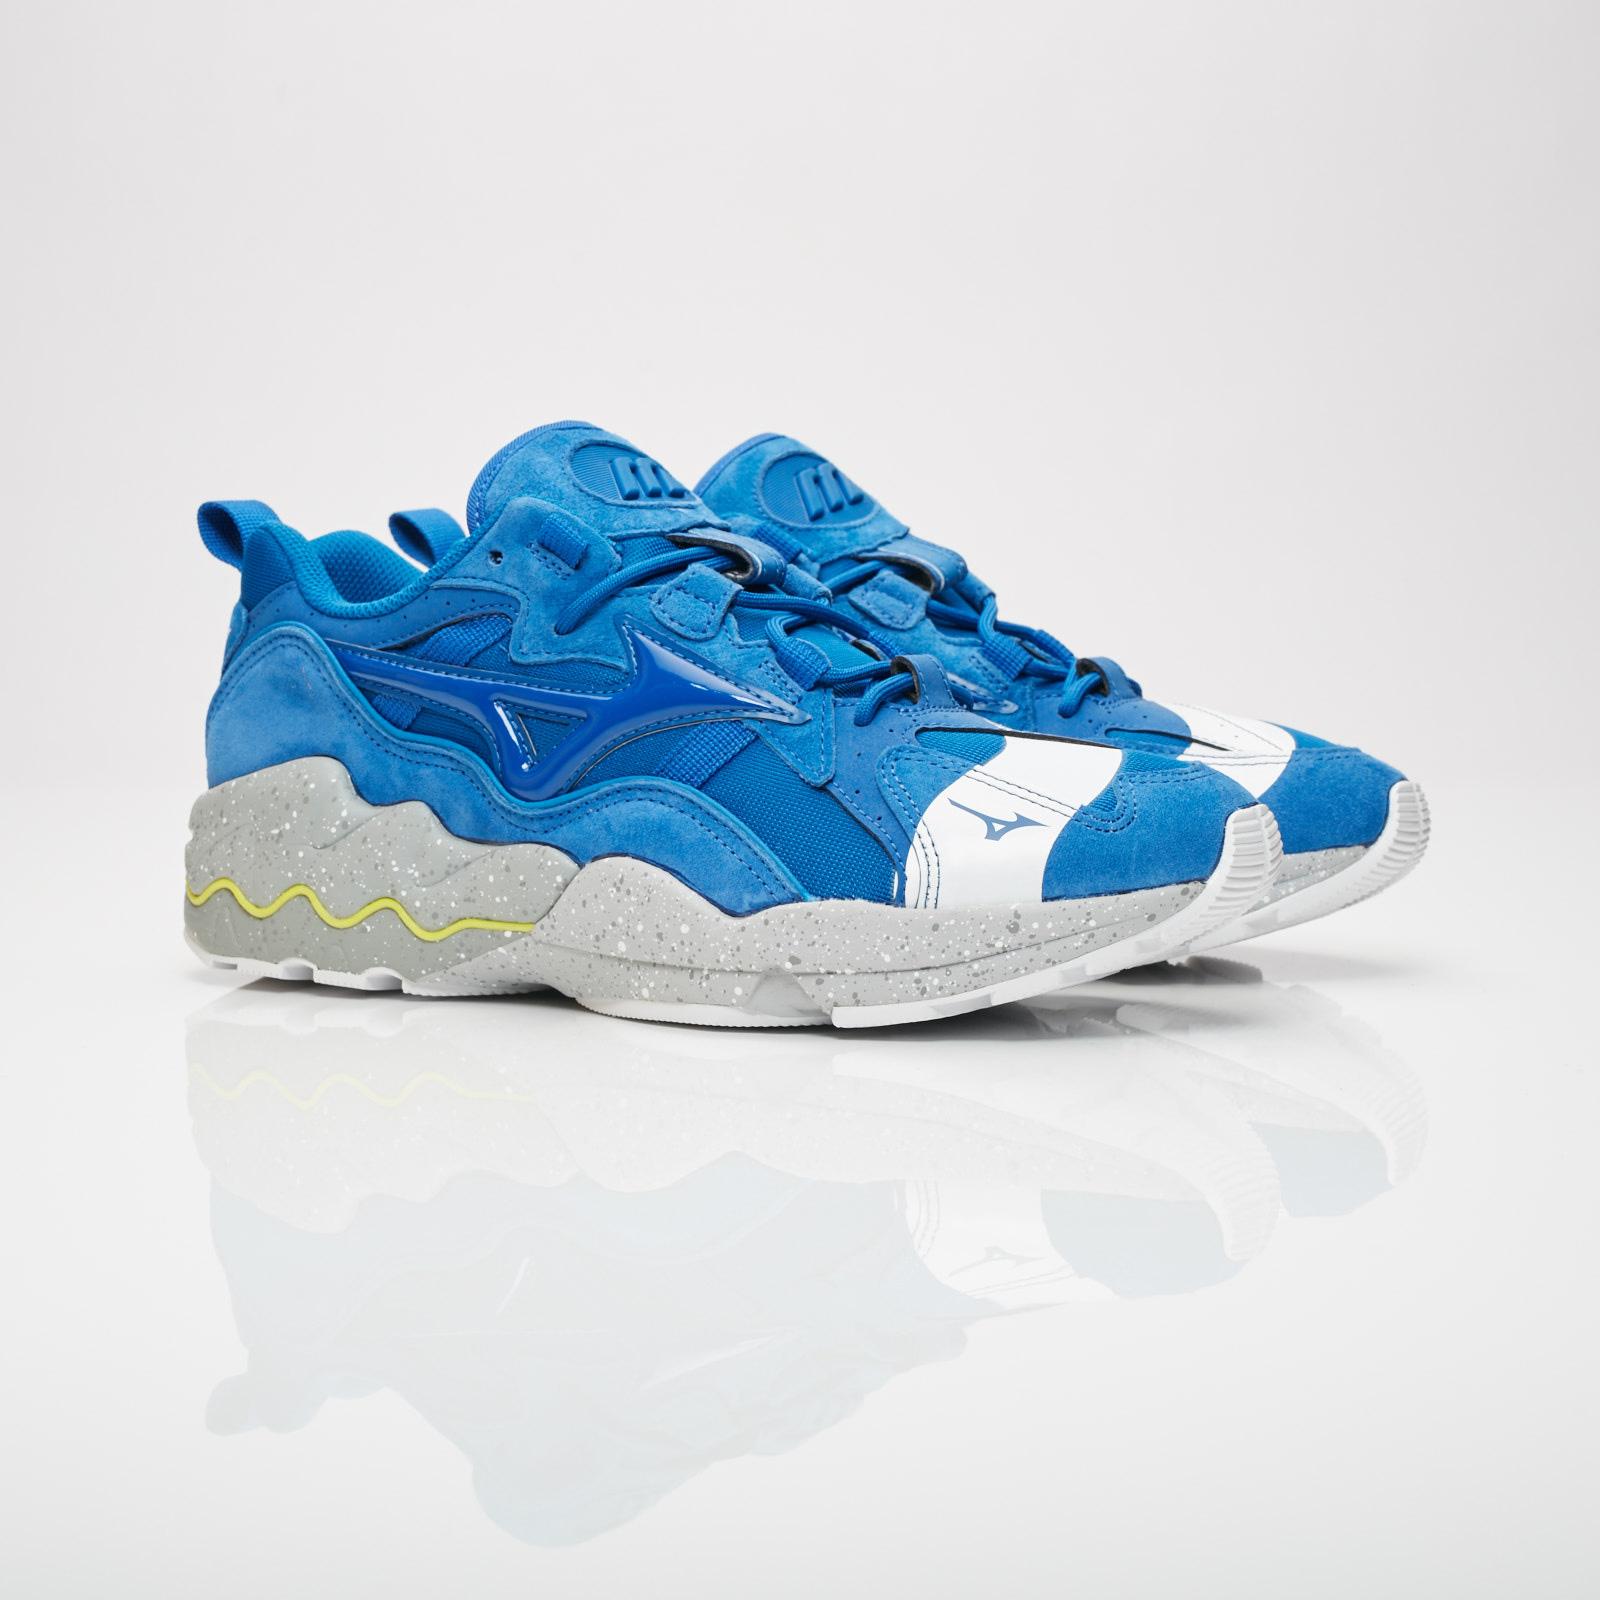 Mizuno Wave Rider 1 x mita sneakers - D1gd180027 - Sneakersnstuff ... 22831d7f9643b